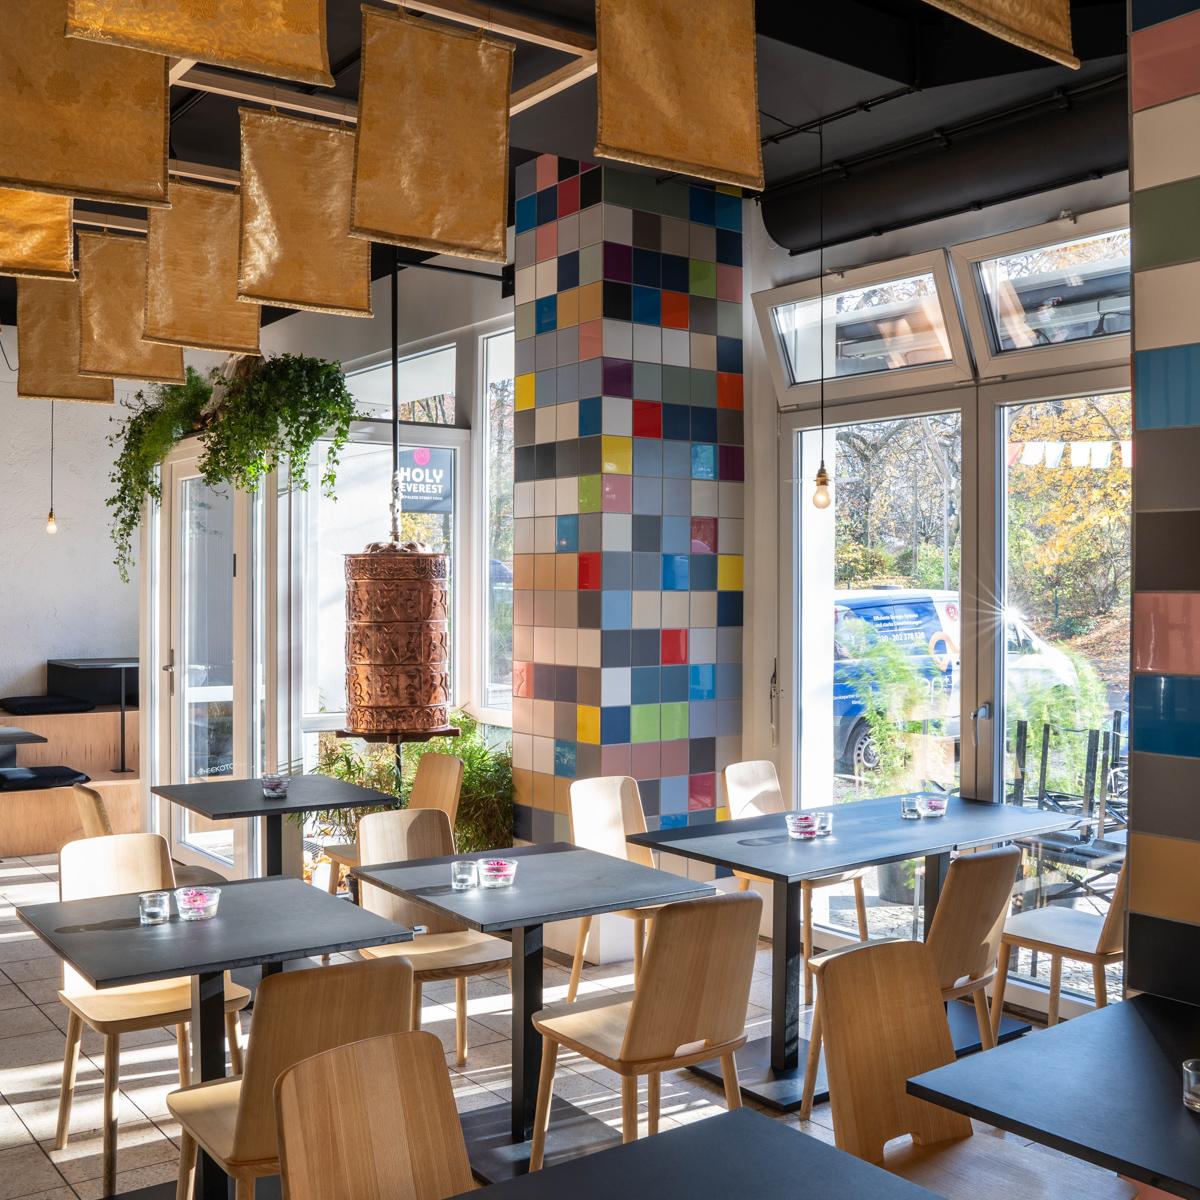 Holy Everest Restaurant Berlin Prenzlauer Berg-2